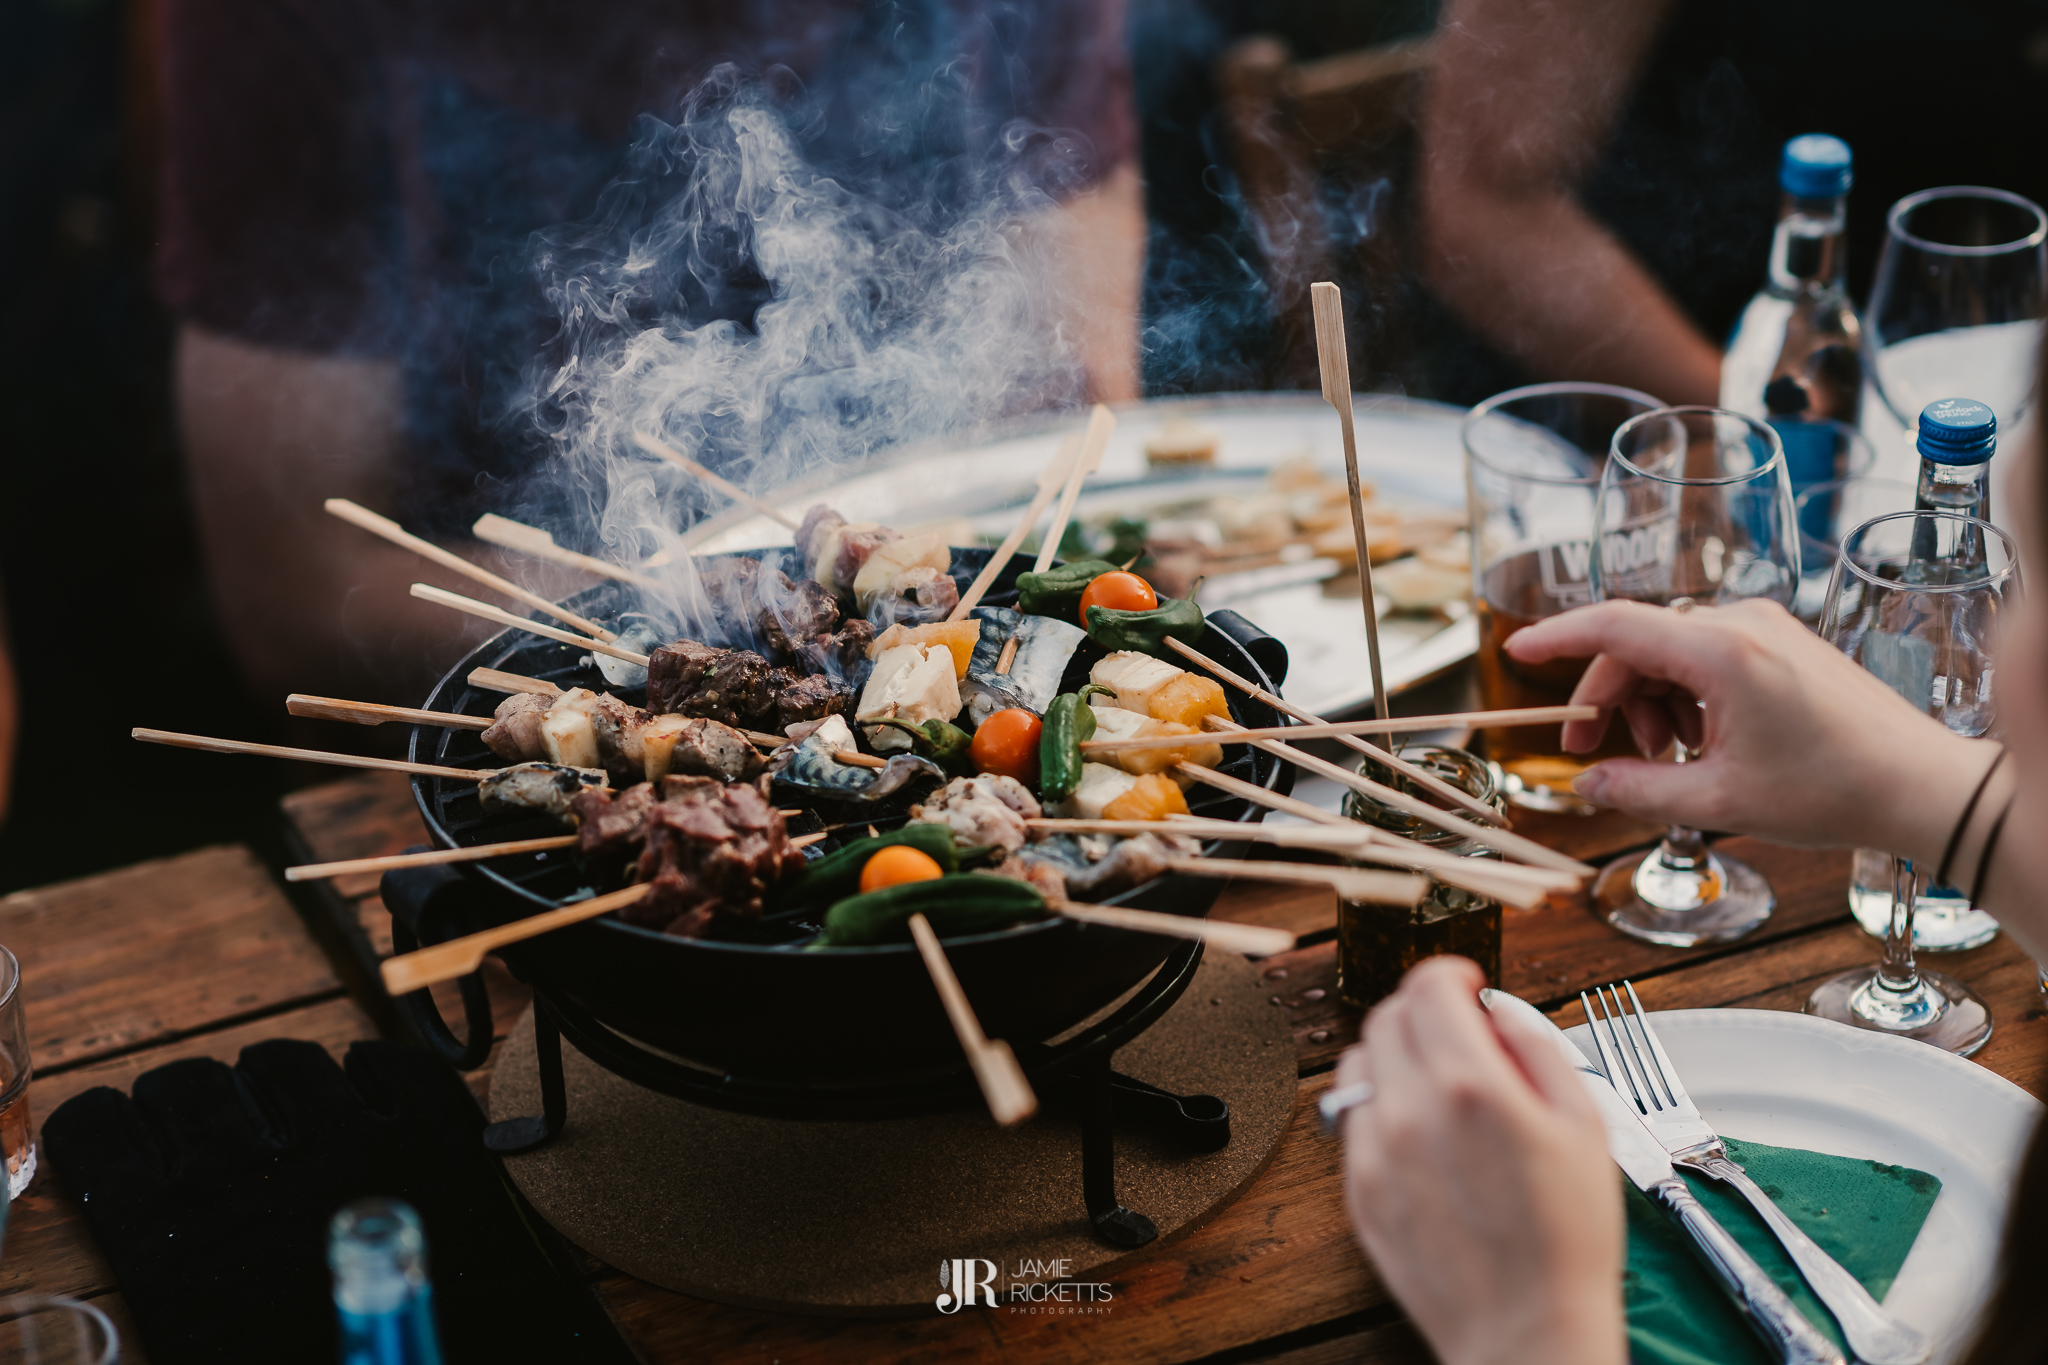 BBQ BANQUET NIGHT-28.06.2019-JR-SM-37.JPG